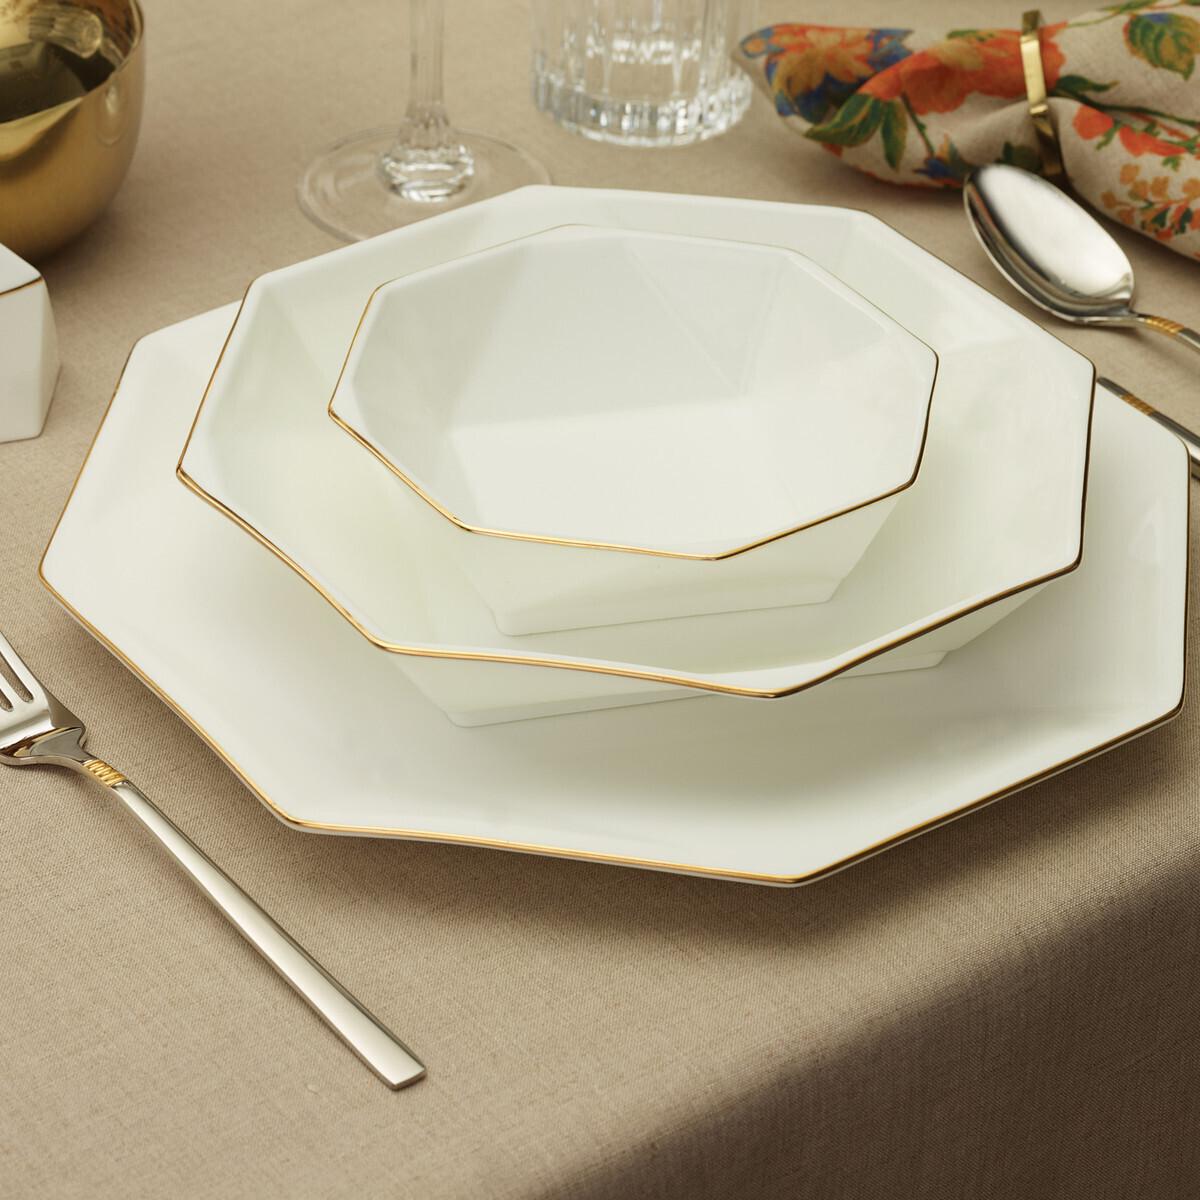 KARACA FINE PEARL EXTRA QUARTZ GOLD 62 PIECES DINNER SET